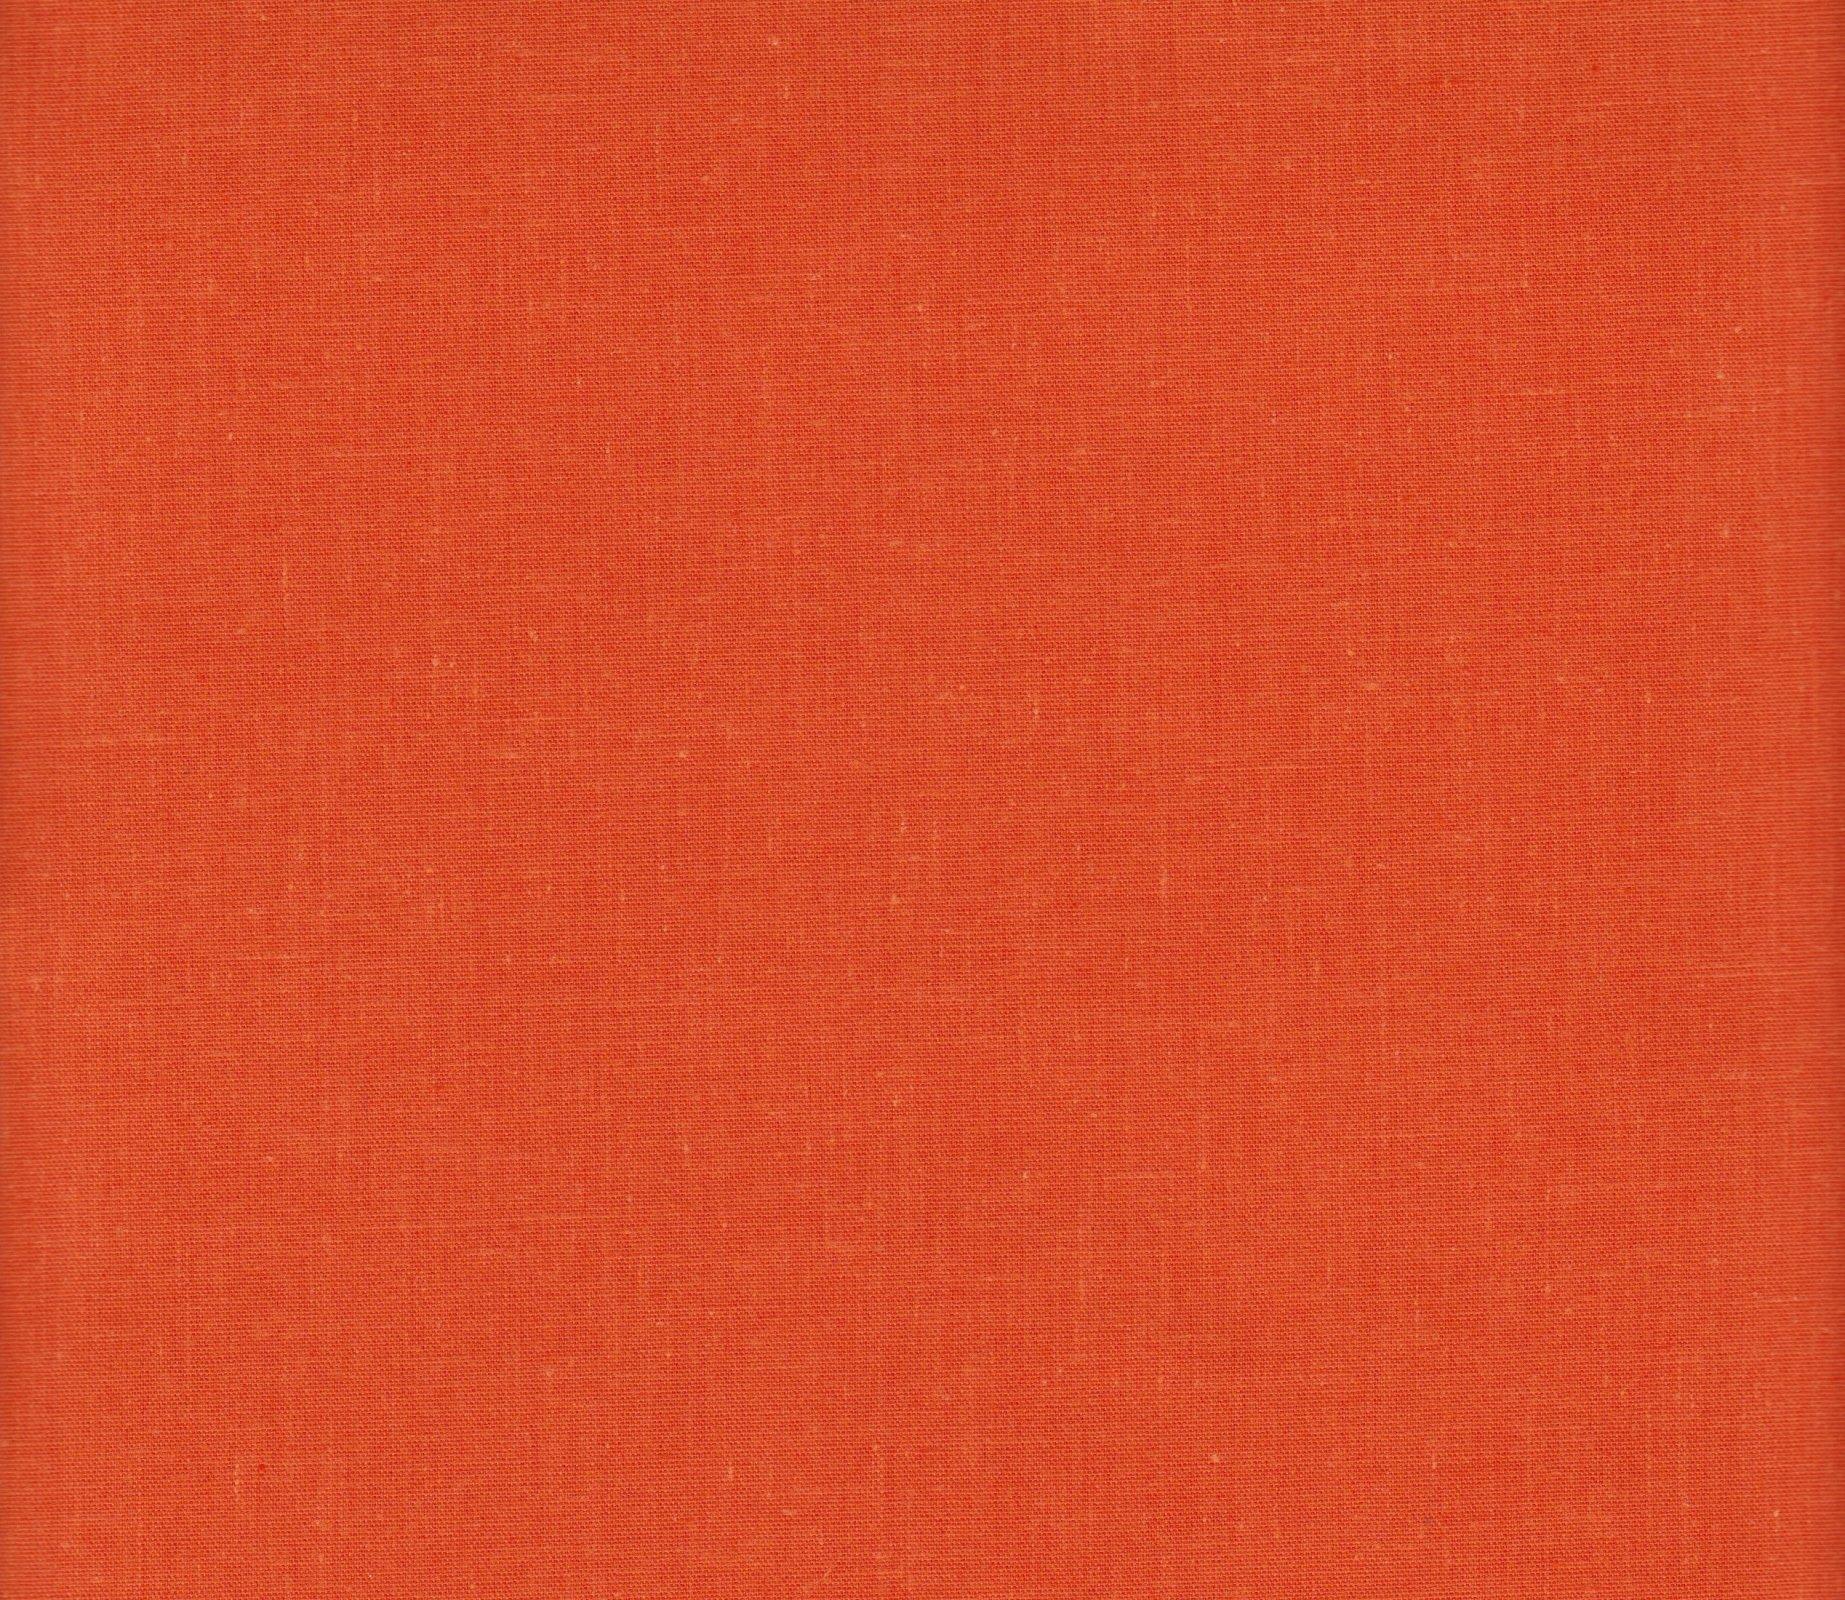 PROMO* Raleigh Cotton/Poly Broadcloth - Orange